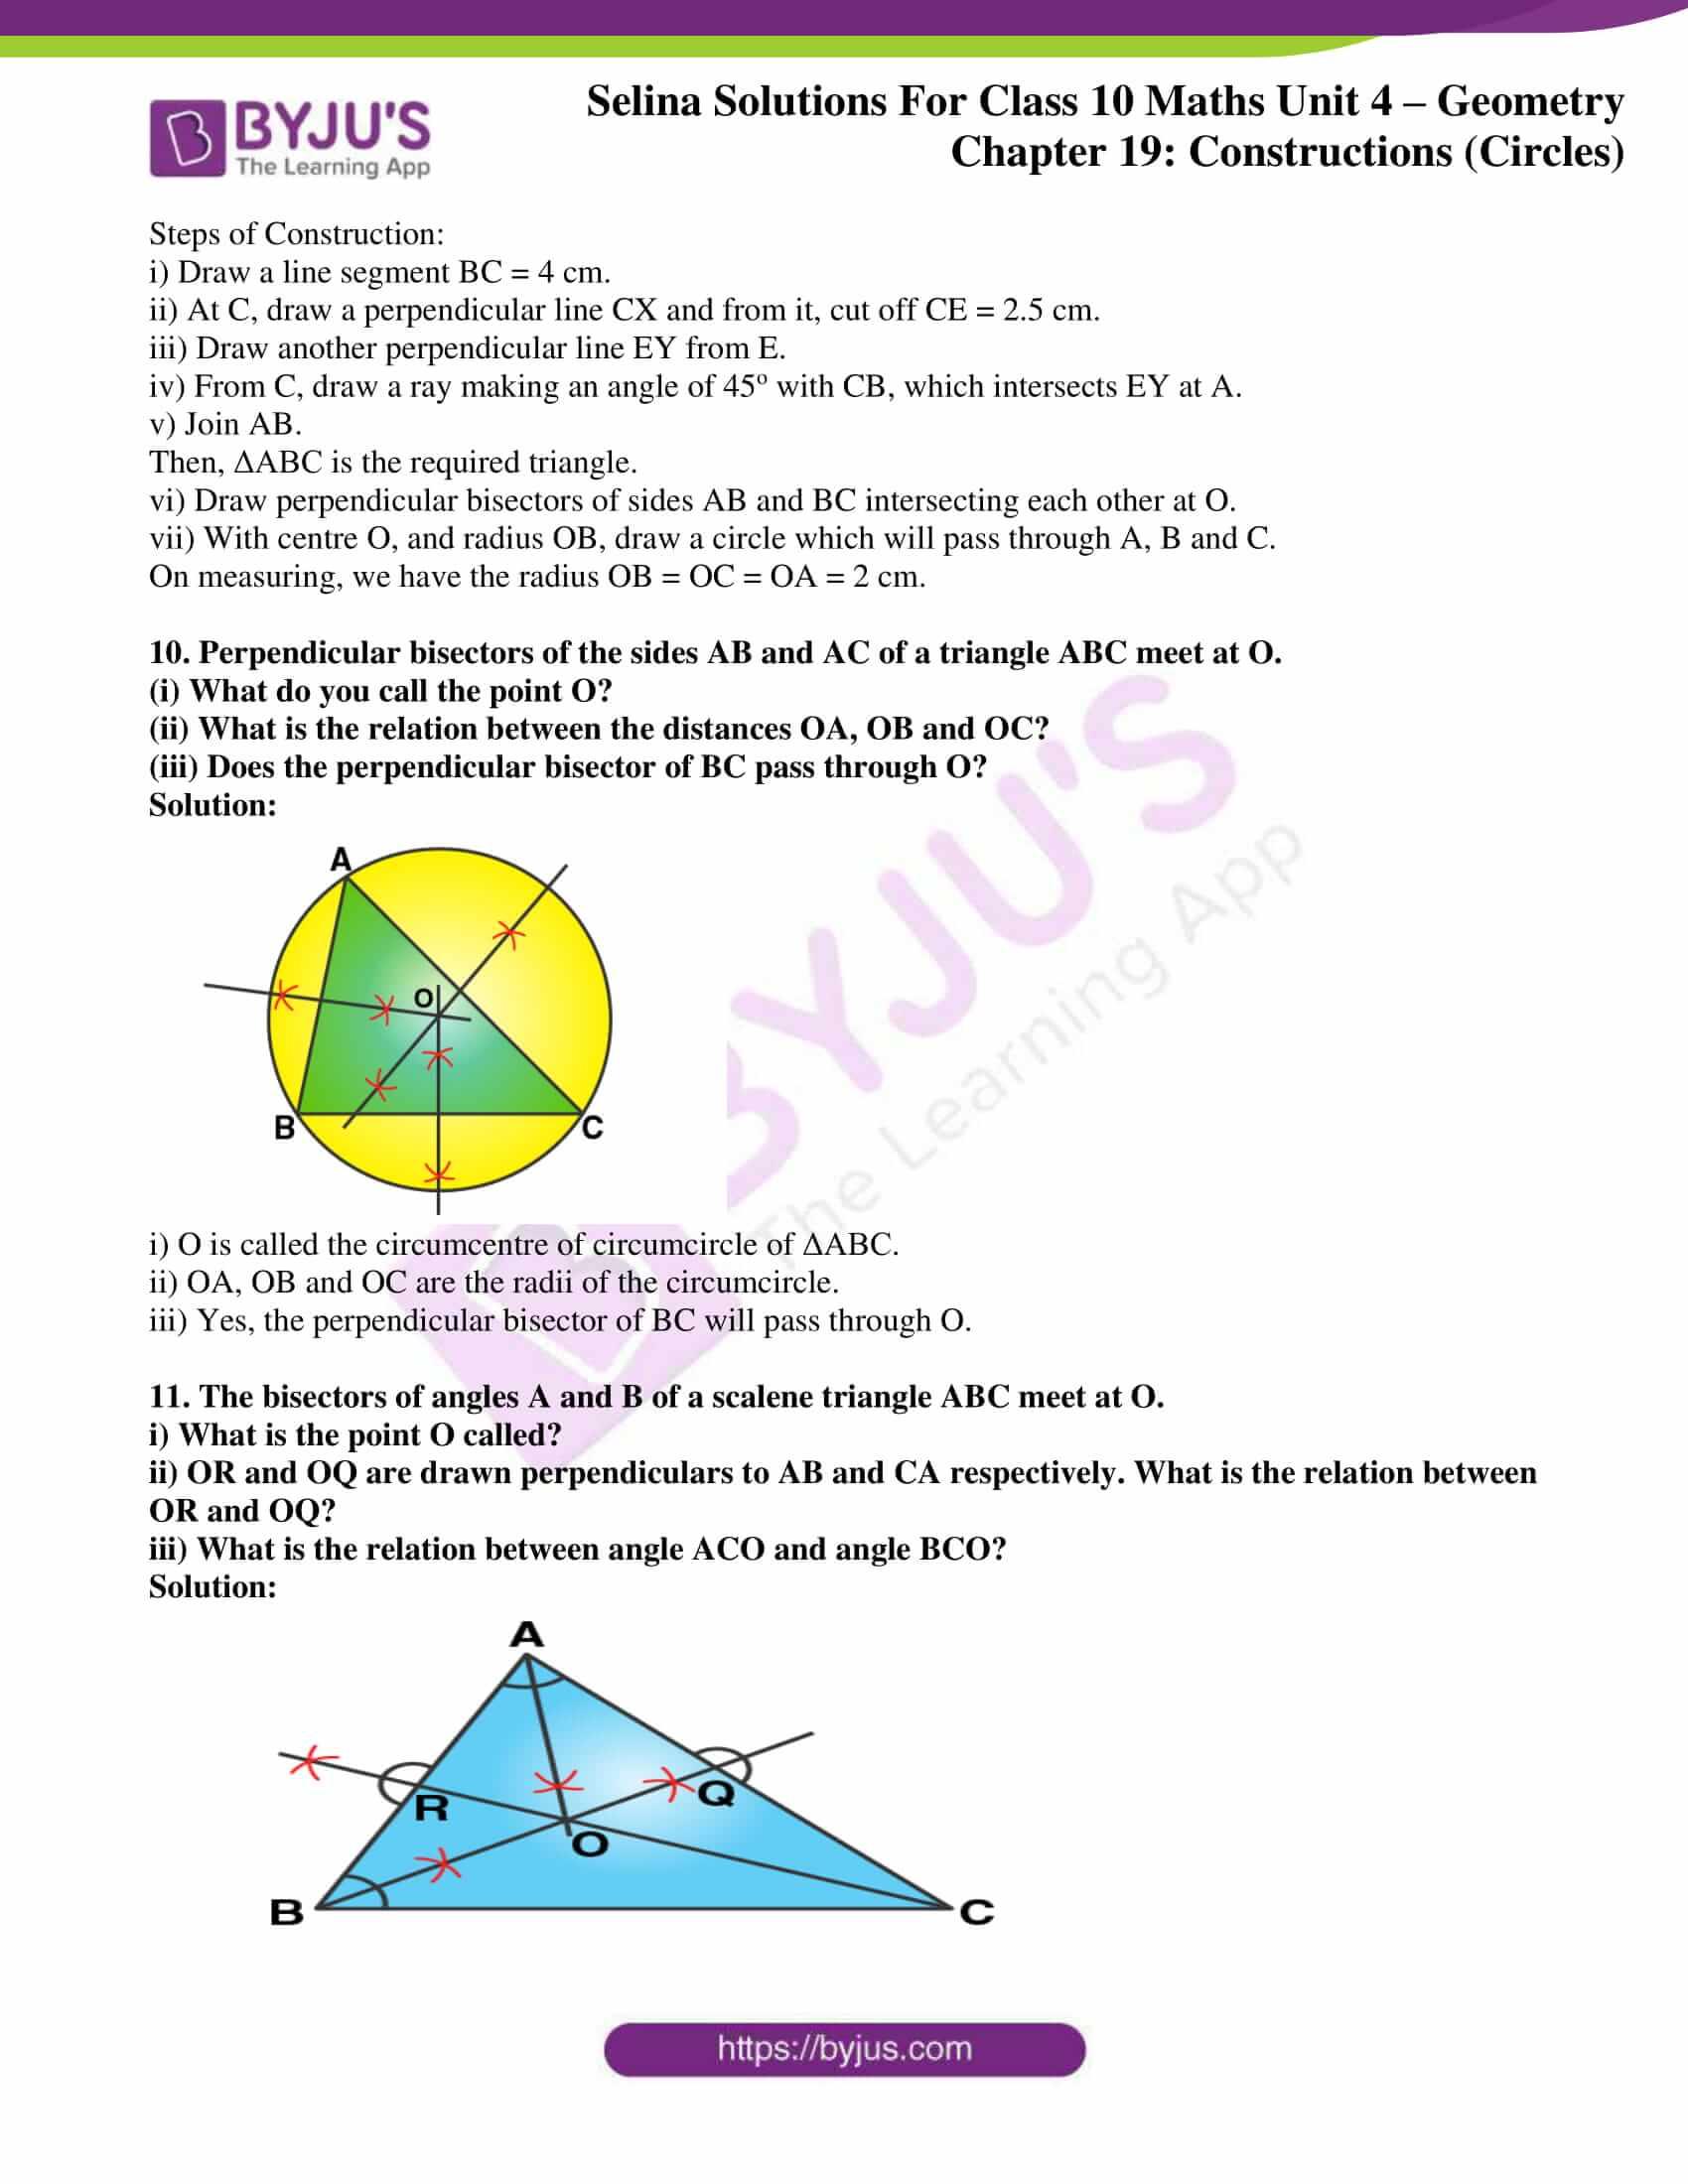 selina-sol-maths-class-10-ch-19-6